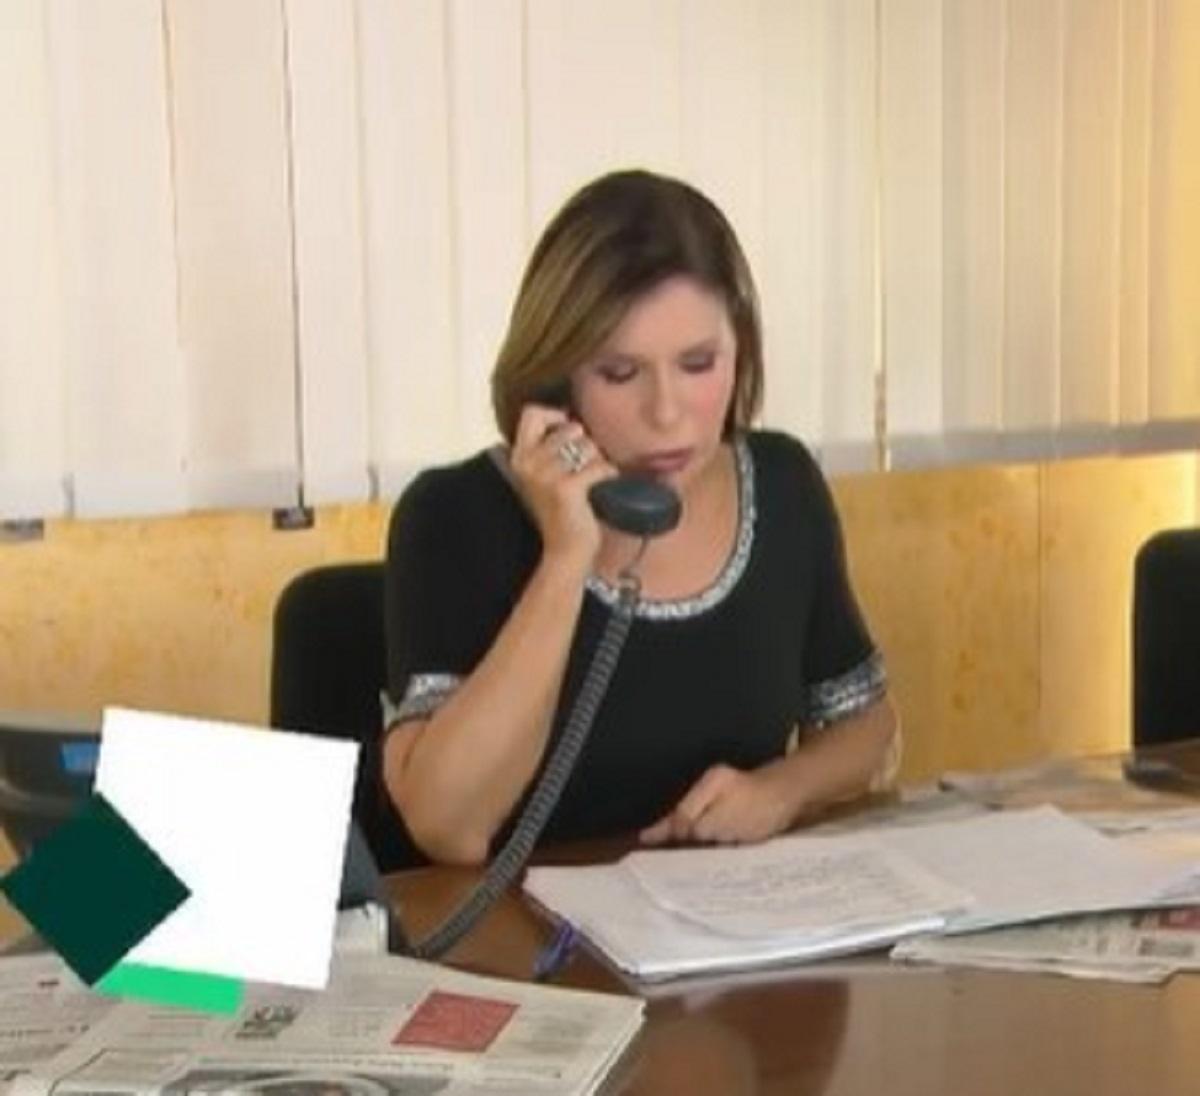 Bianca Berlinguer Cartabianca annuncio sorpresa Mauro Corona